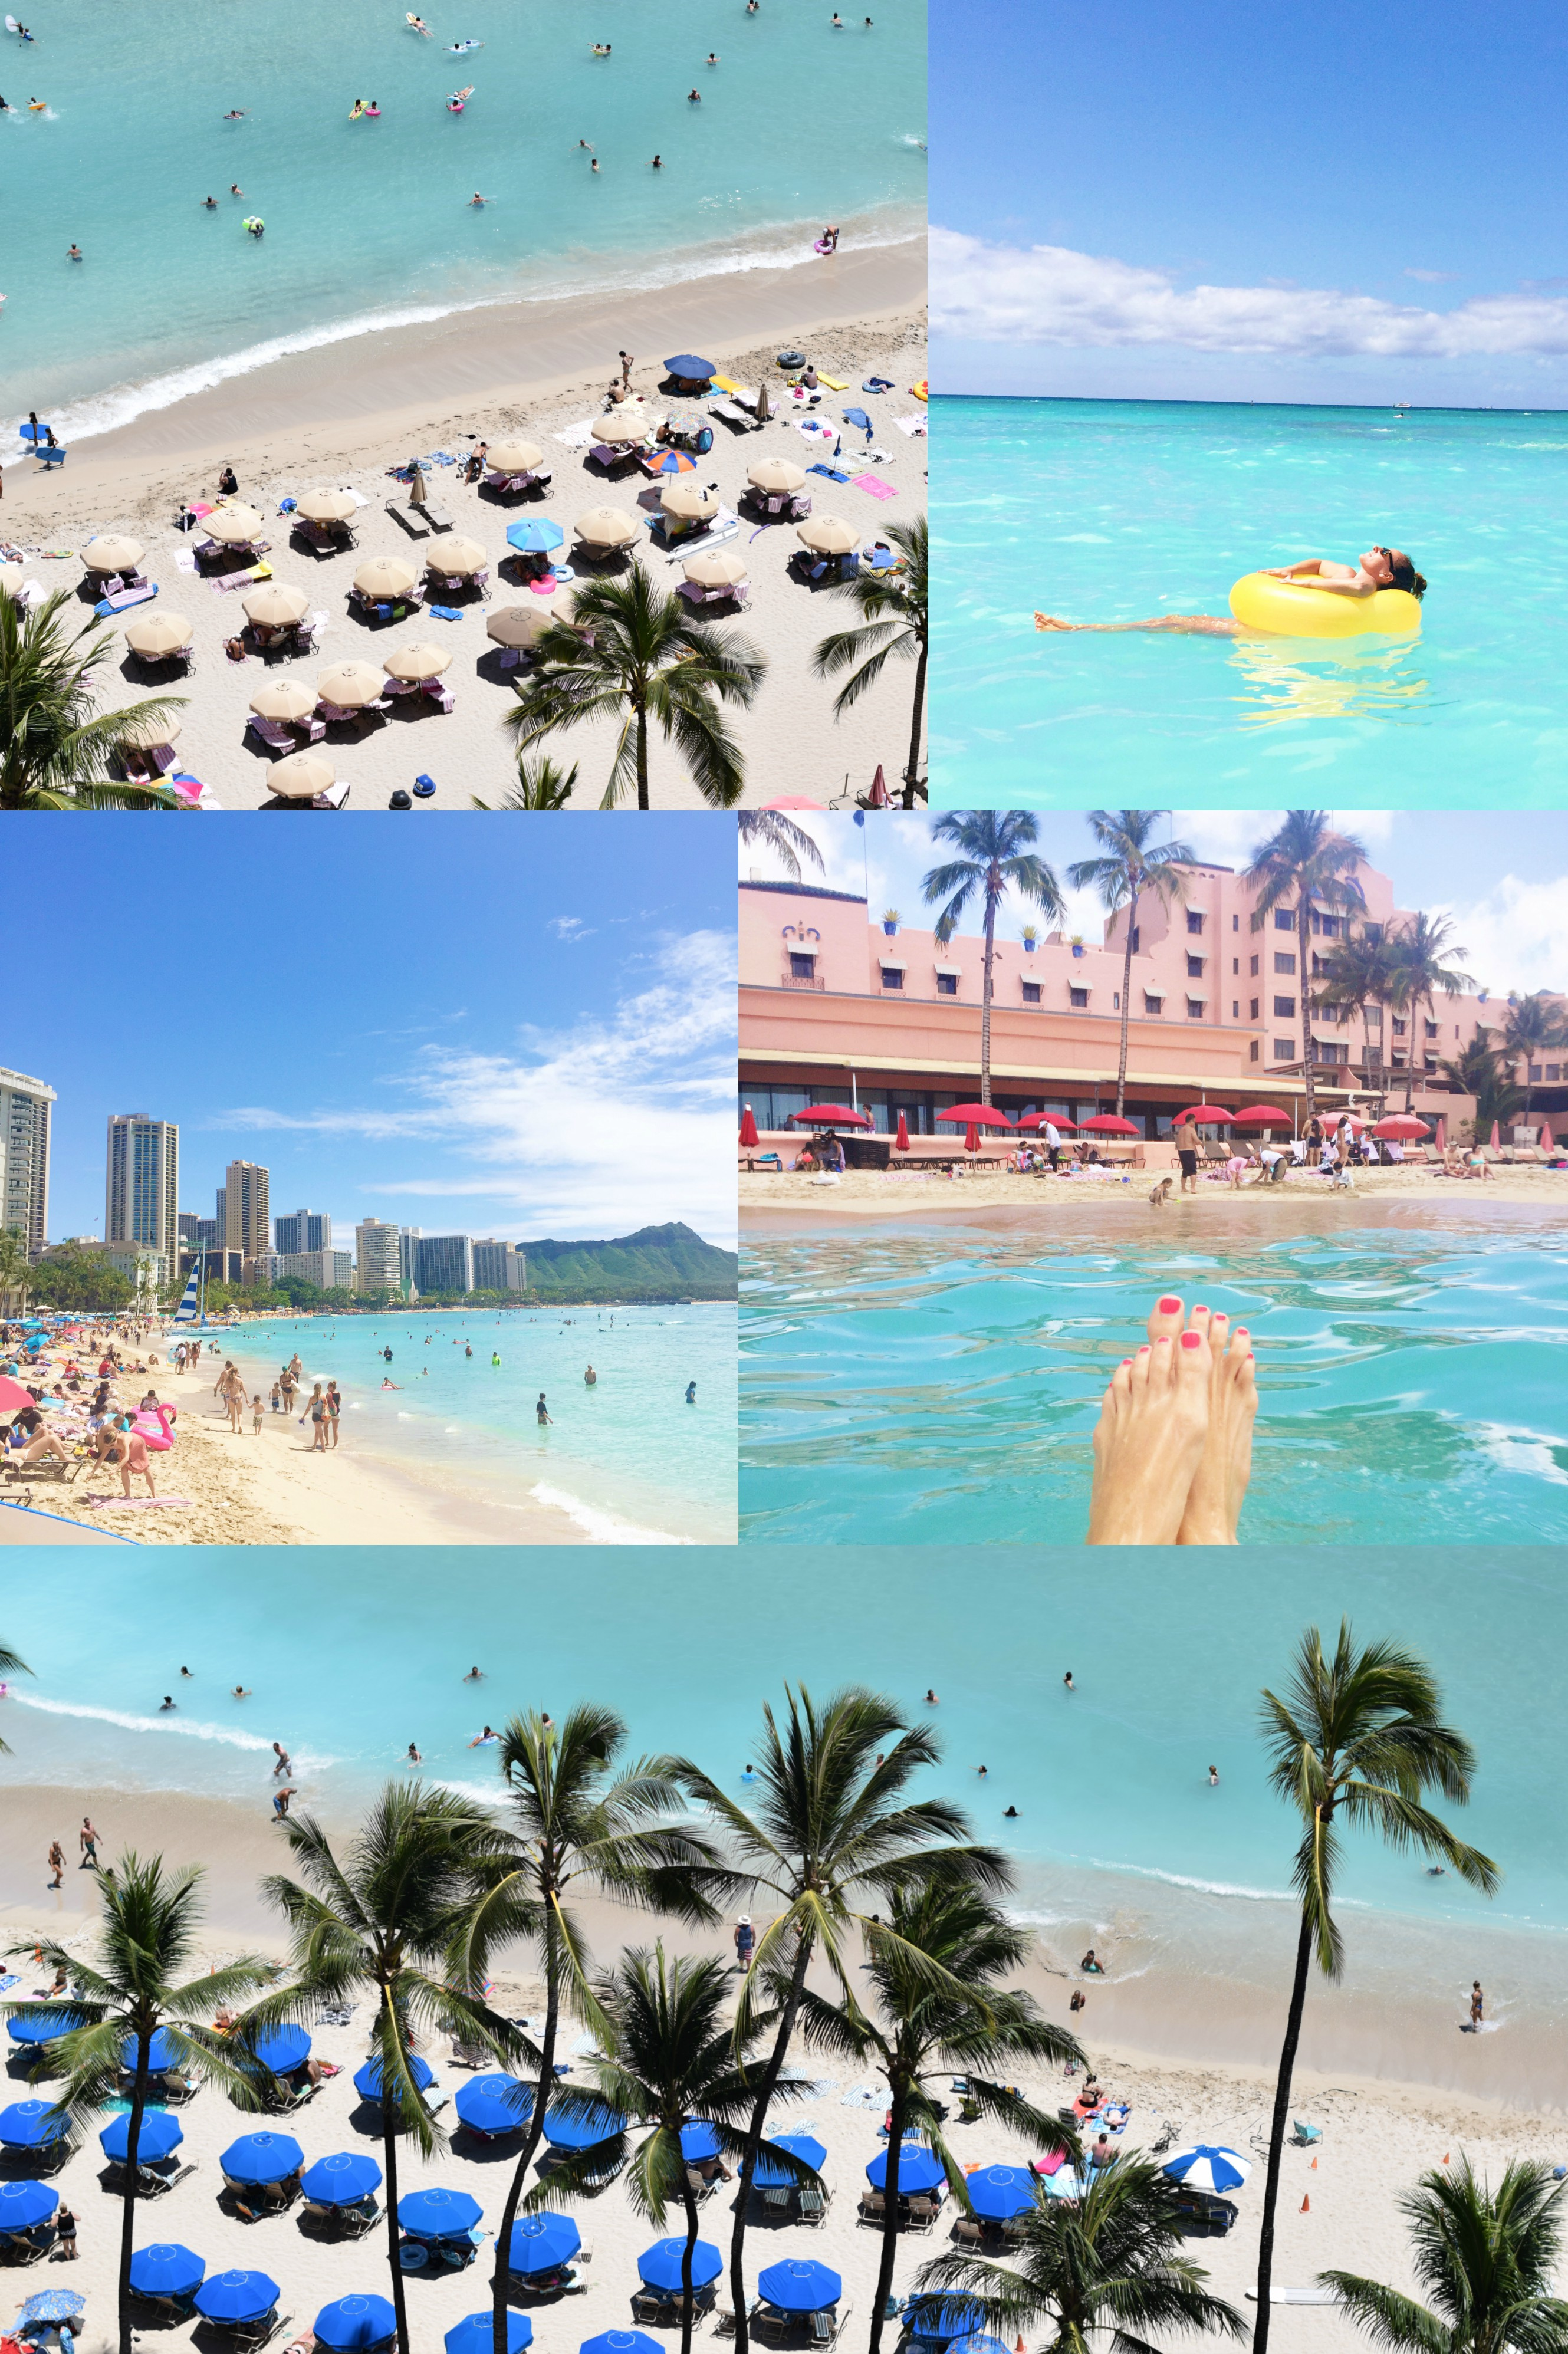 Waikiki Beach - The Instagram Guide To Honolulu - Instagram Worthy Spots Honolulu - Oahu Guide For Instagram - Best Places To Take Photos Honolulu - Oahu Vacation Guide - Where To Visit Hawaii - Hawaii Itinerary - Communikait by Kait Hanson